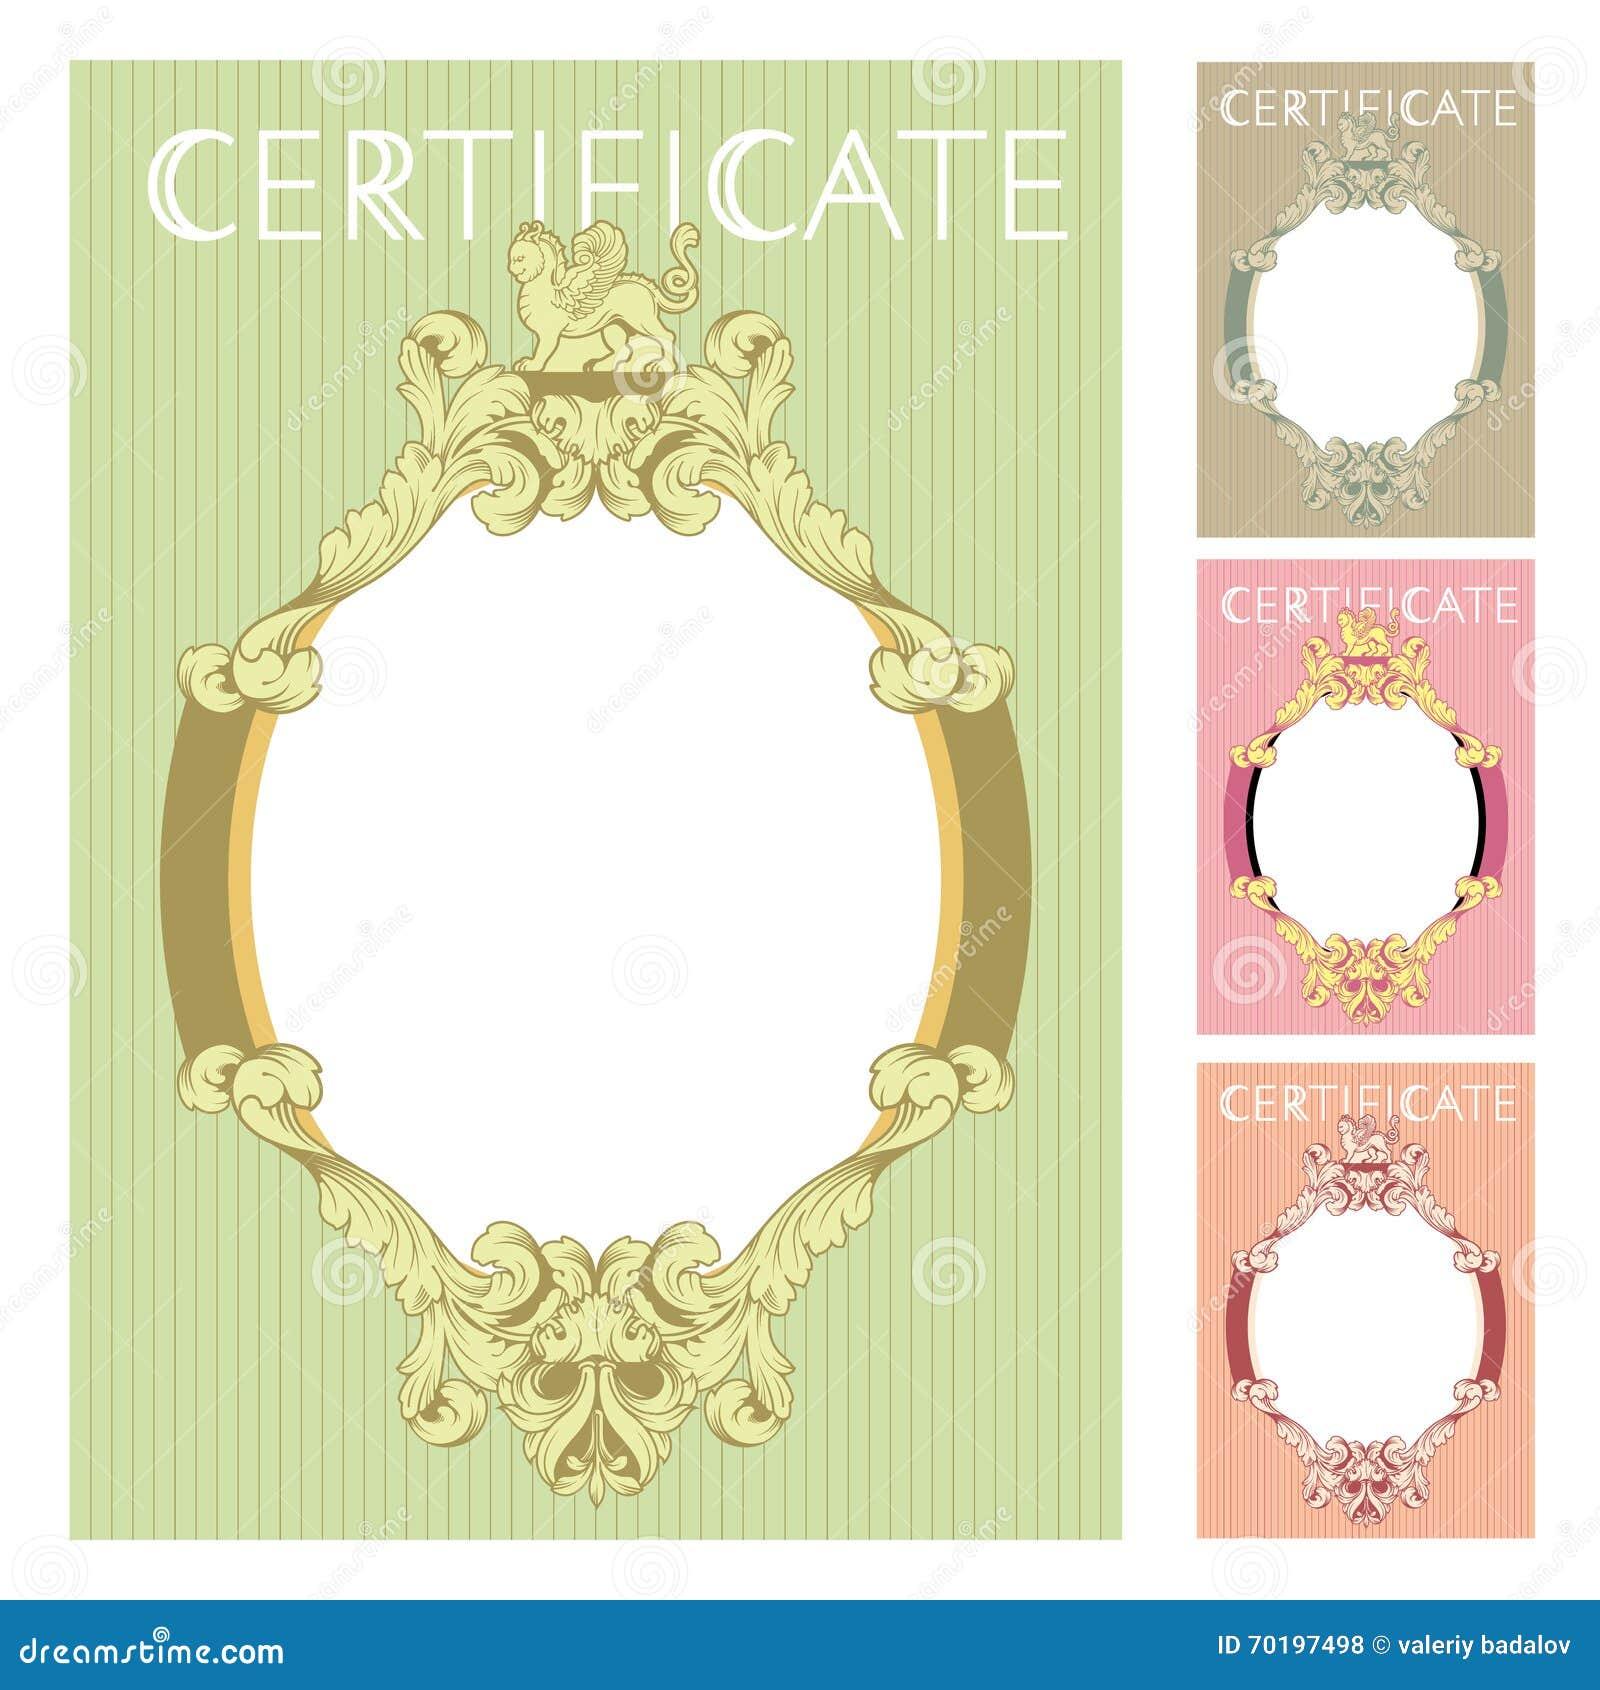 Certificate design template in baroque style